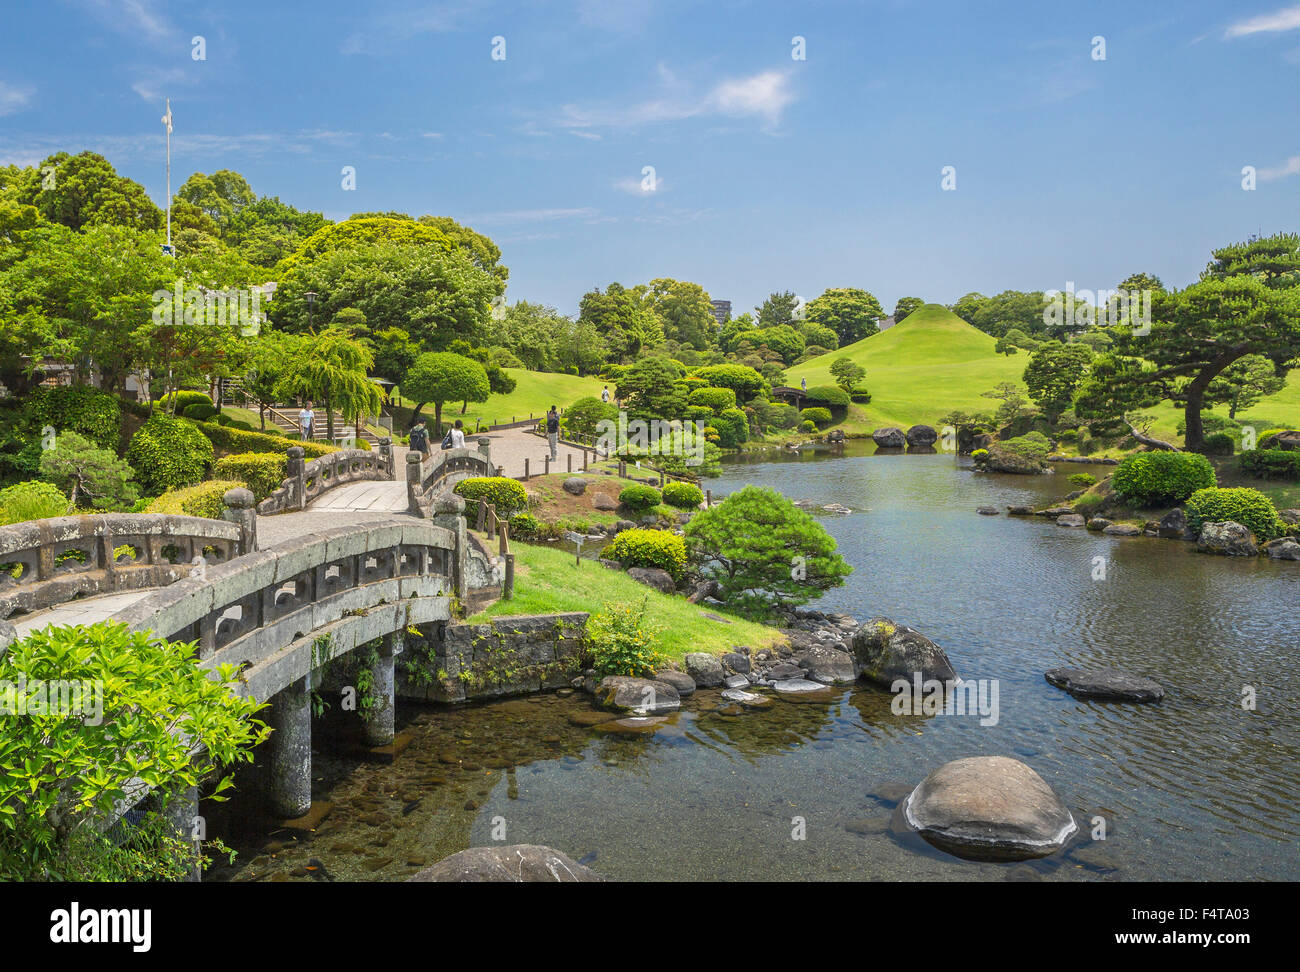 Le Japon, l'île de Kyushu, Kumamoto, ville jardin Suizenji Photo Stock